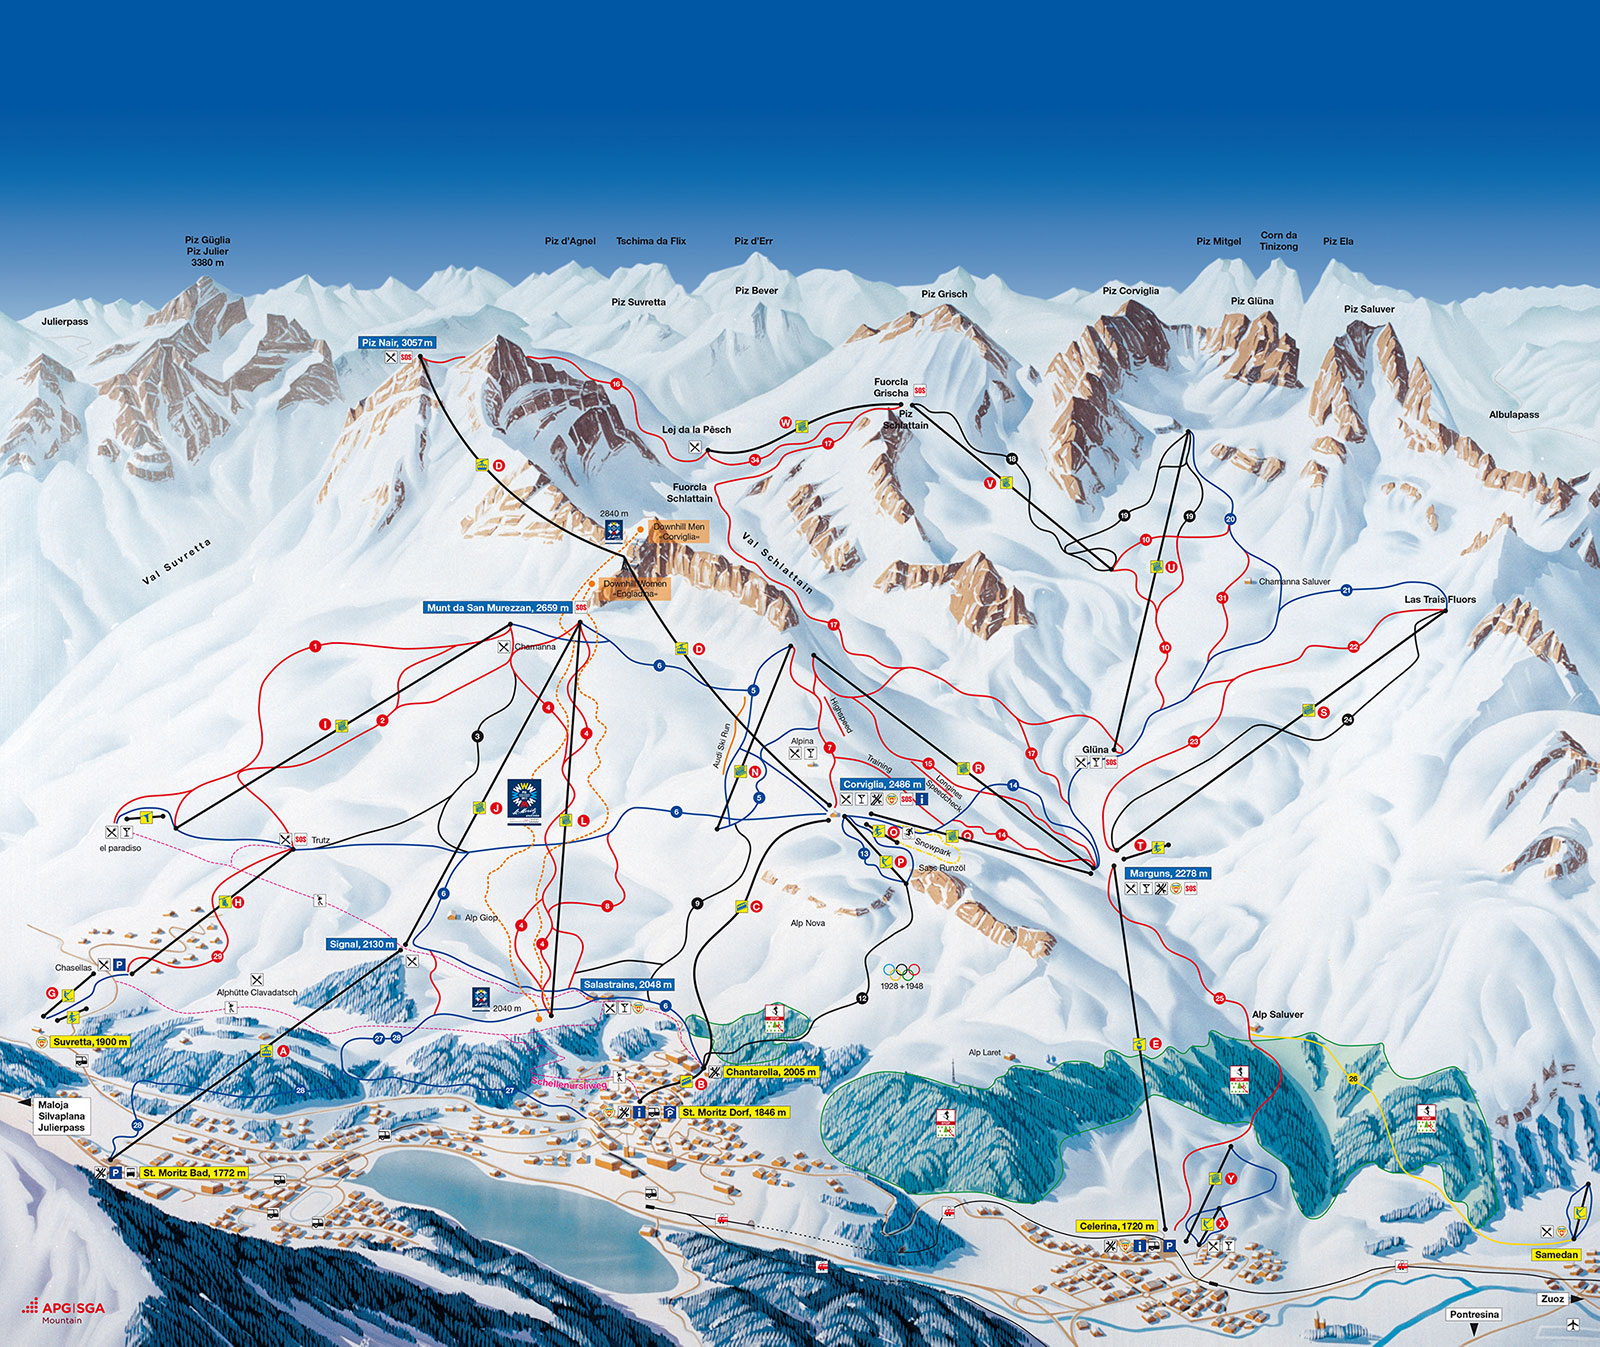 St. Moritz ski map